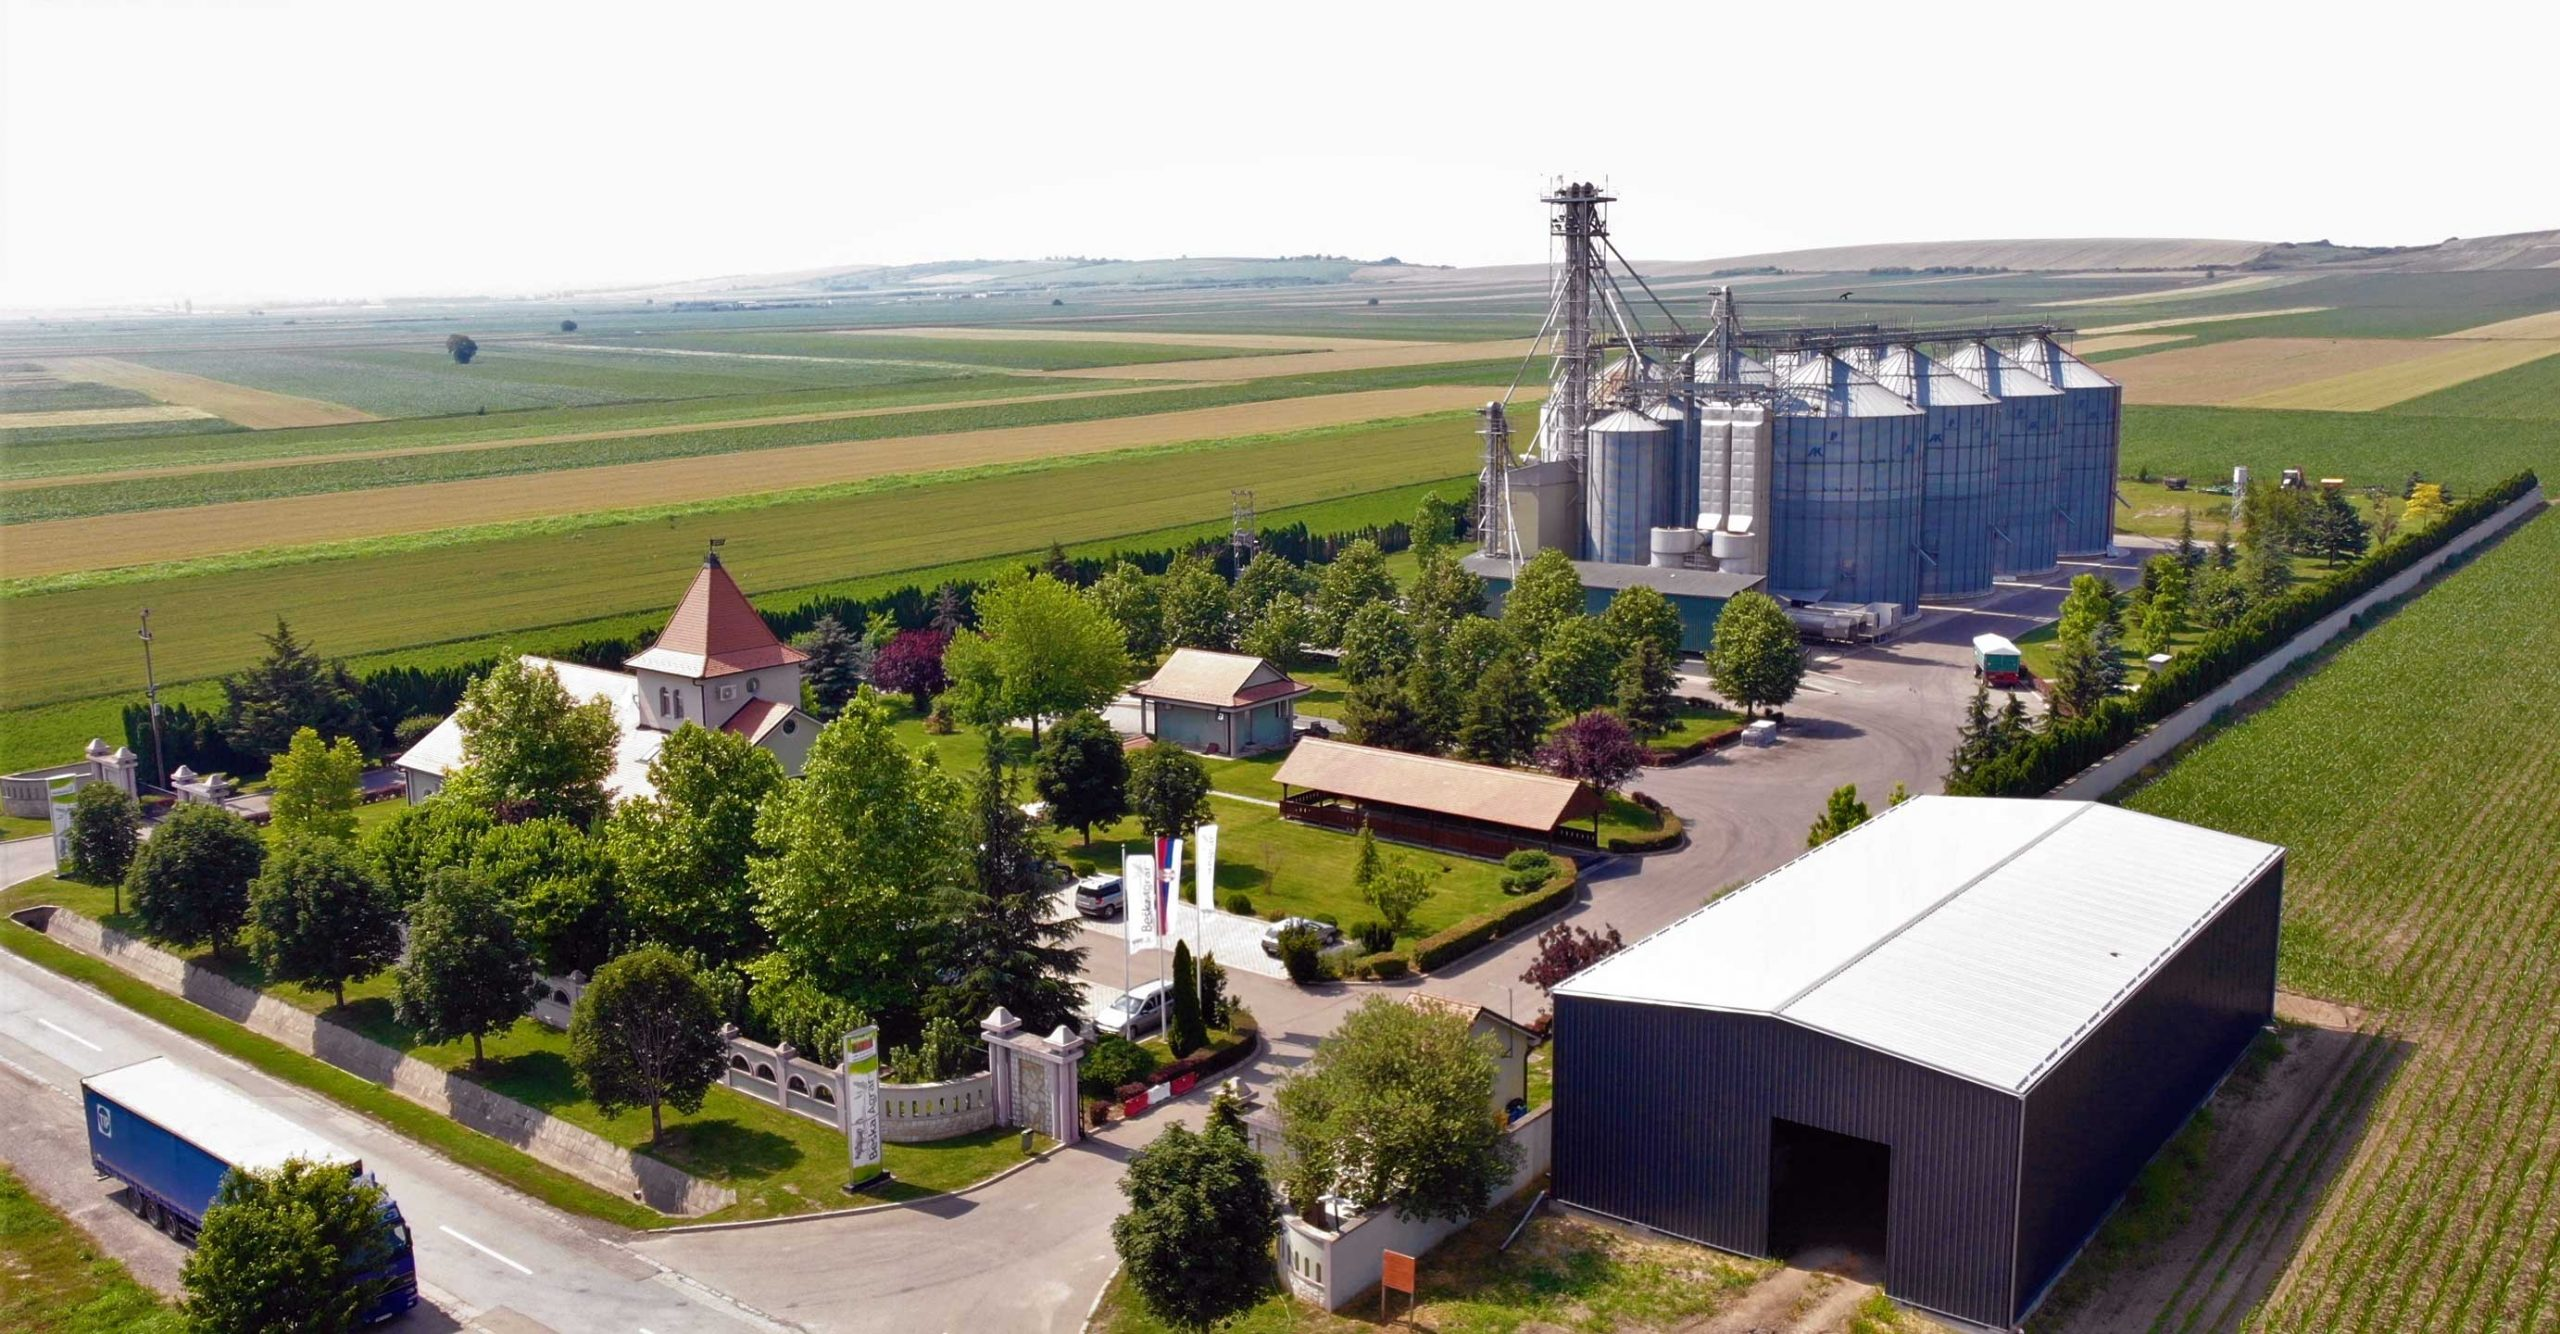 Beška Agrar - Usluge